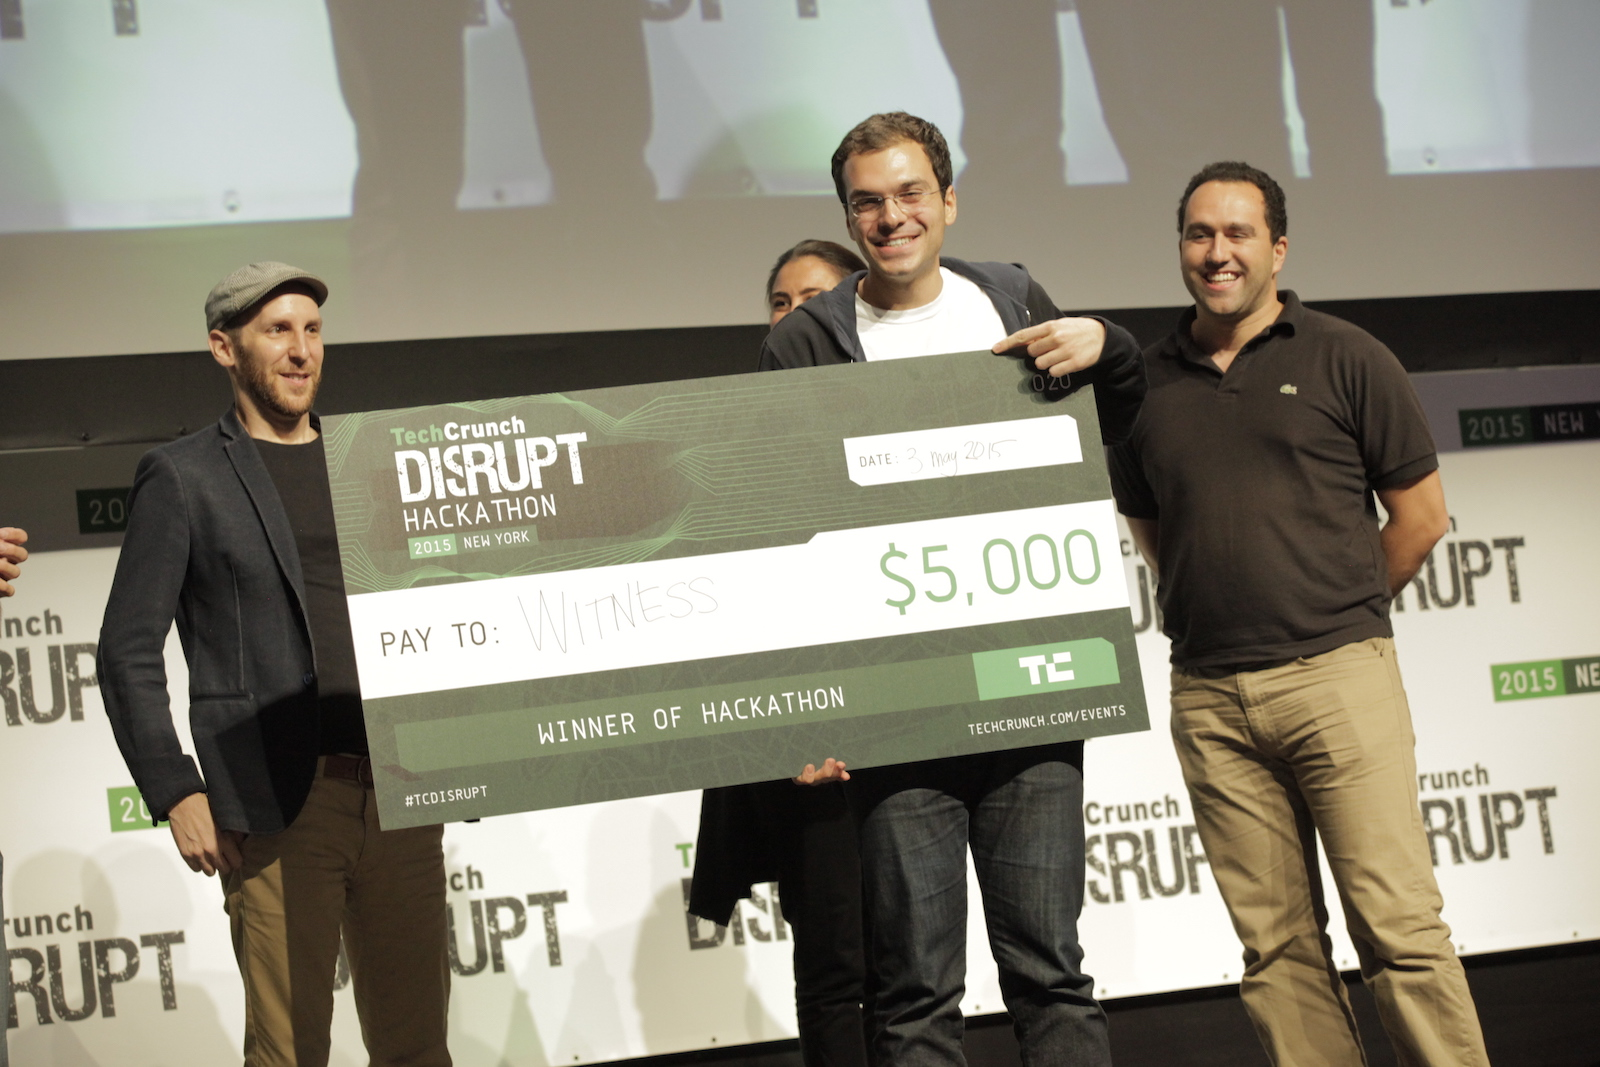 Techcrunch hackathon winner 66f210b1552b8383e5072bbbfb85f03f19598755983817f795c26772409d4980